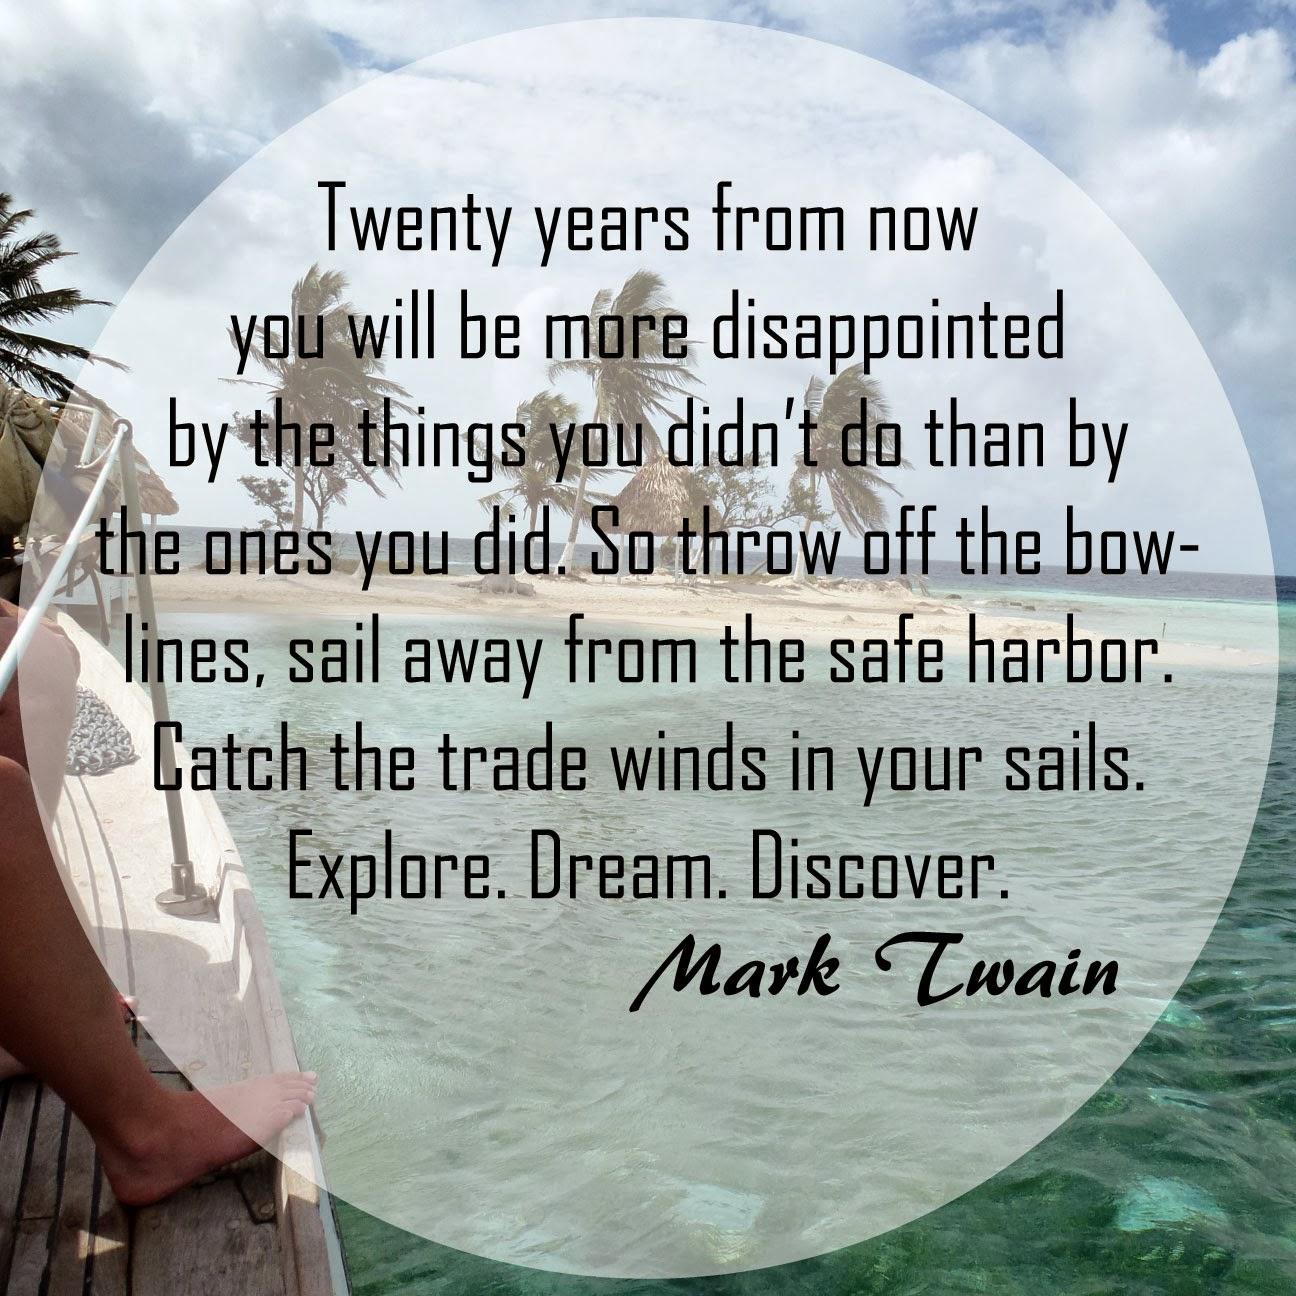 Destination Exploration: Explore. Dream. Discover.